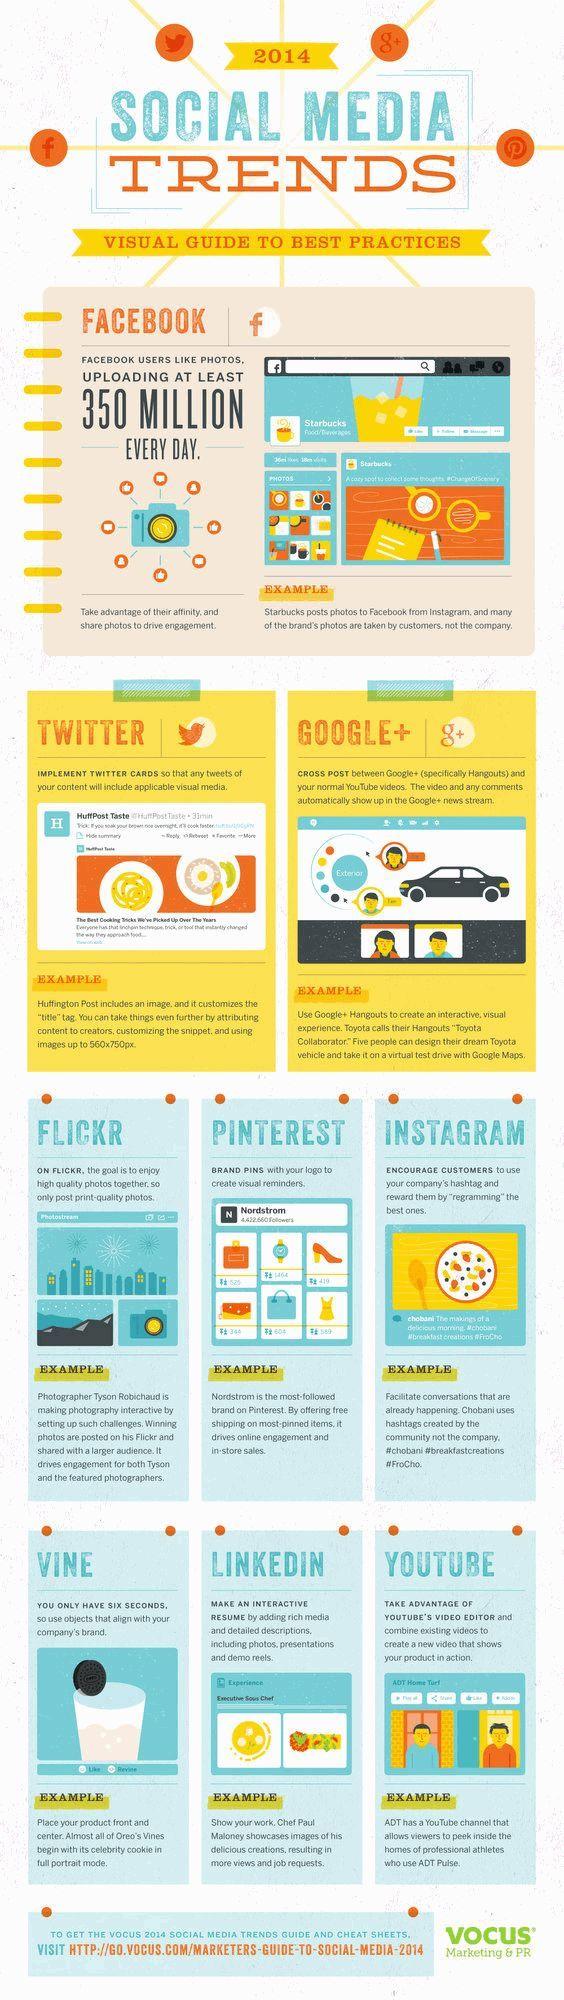 Social Media Marketing Tips and Tricks for Facebook, Twitter, Google+, Instagram, Pinterest, Vine, Flickr, LinkedIn and YouTube.